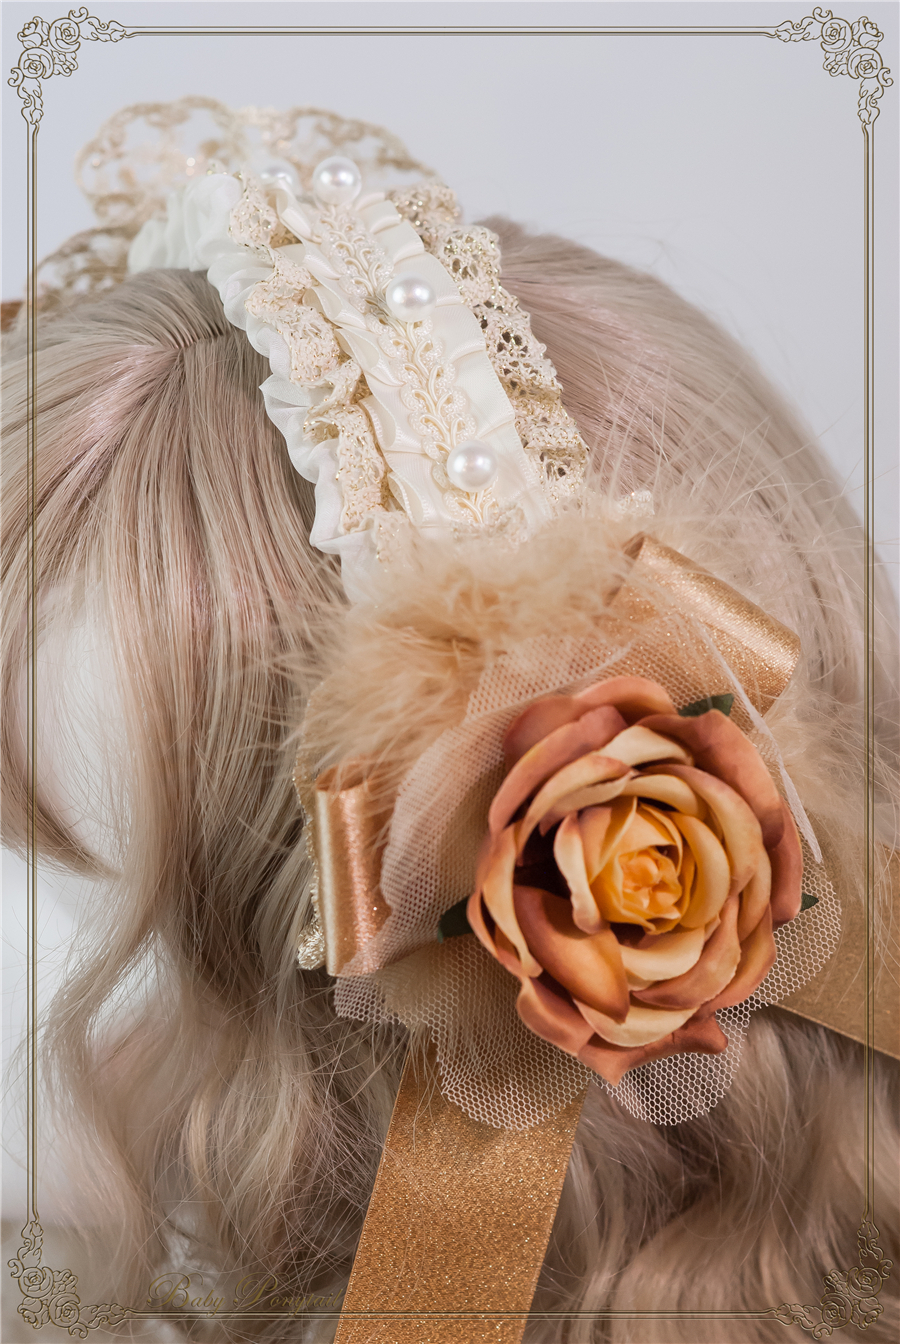 Baby Ponytail_Stock photo_Circus Princess_Rose Head Dress Golden_01.jpg